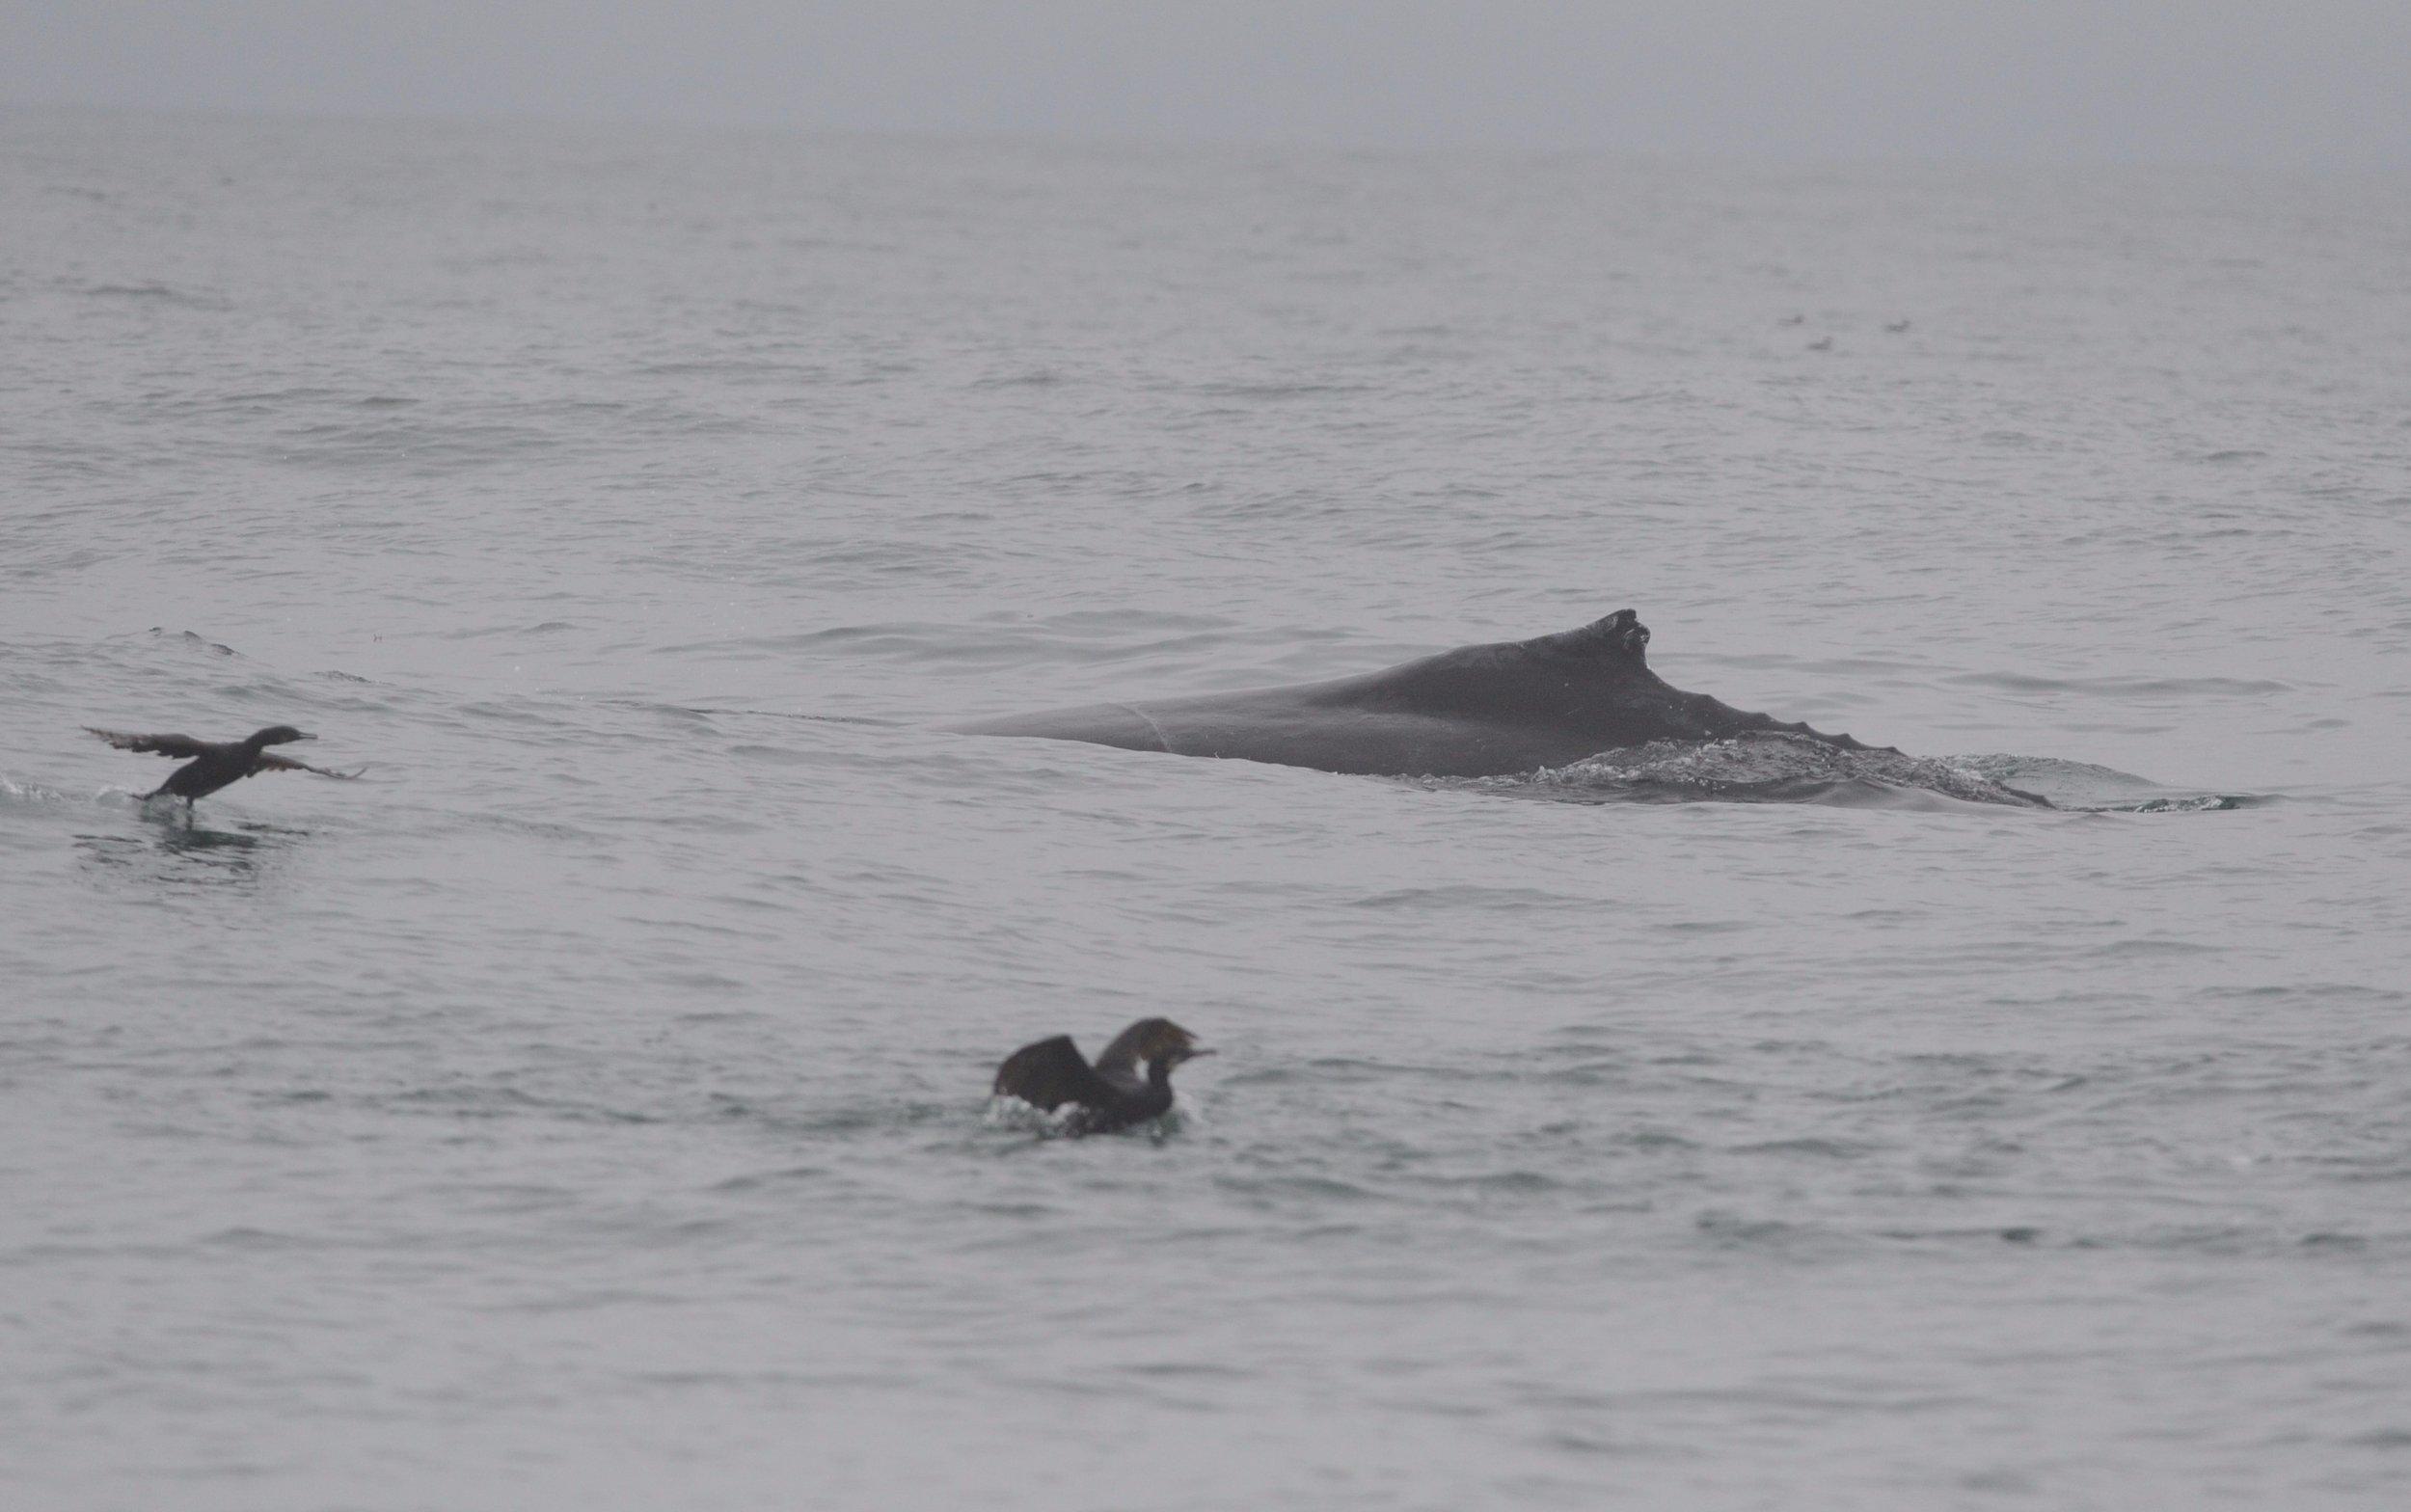 Humpback with distinctive dorsal fin.